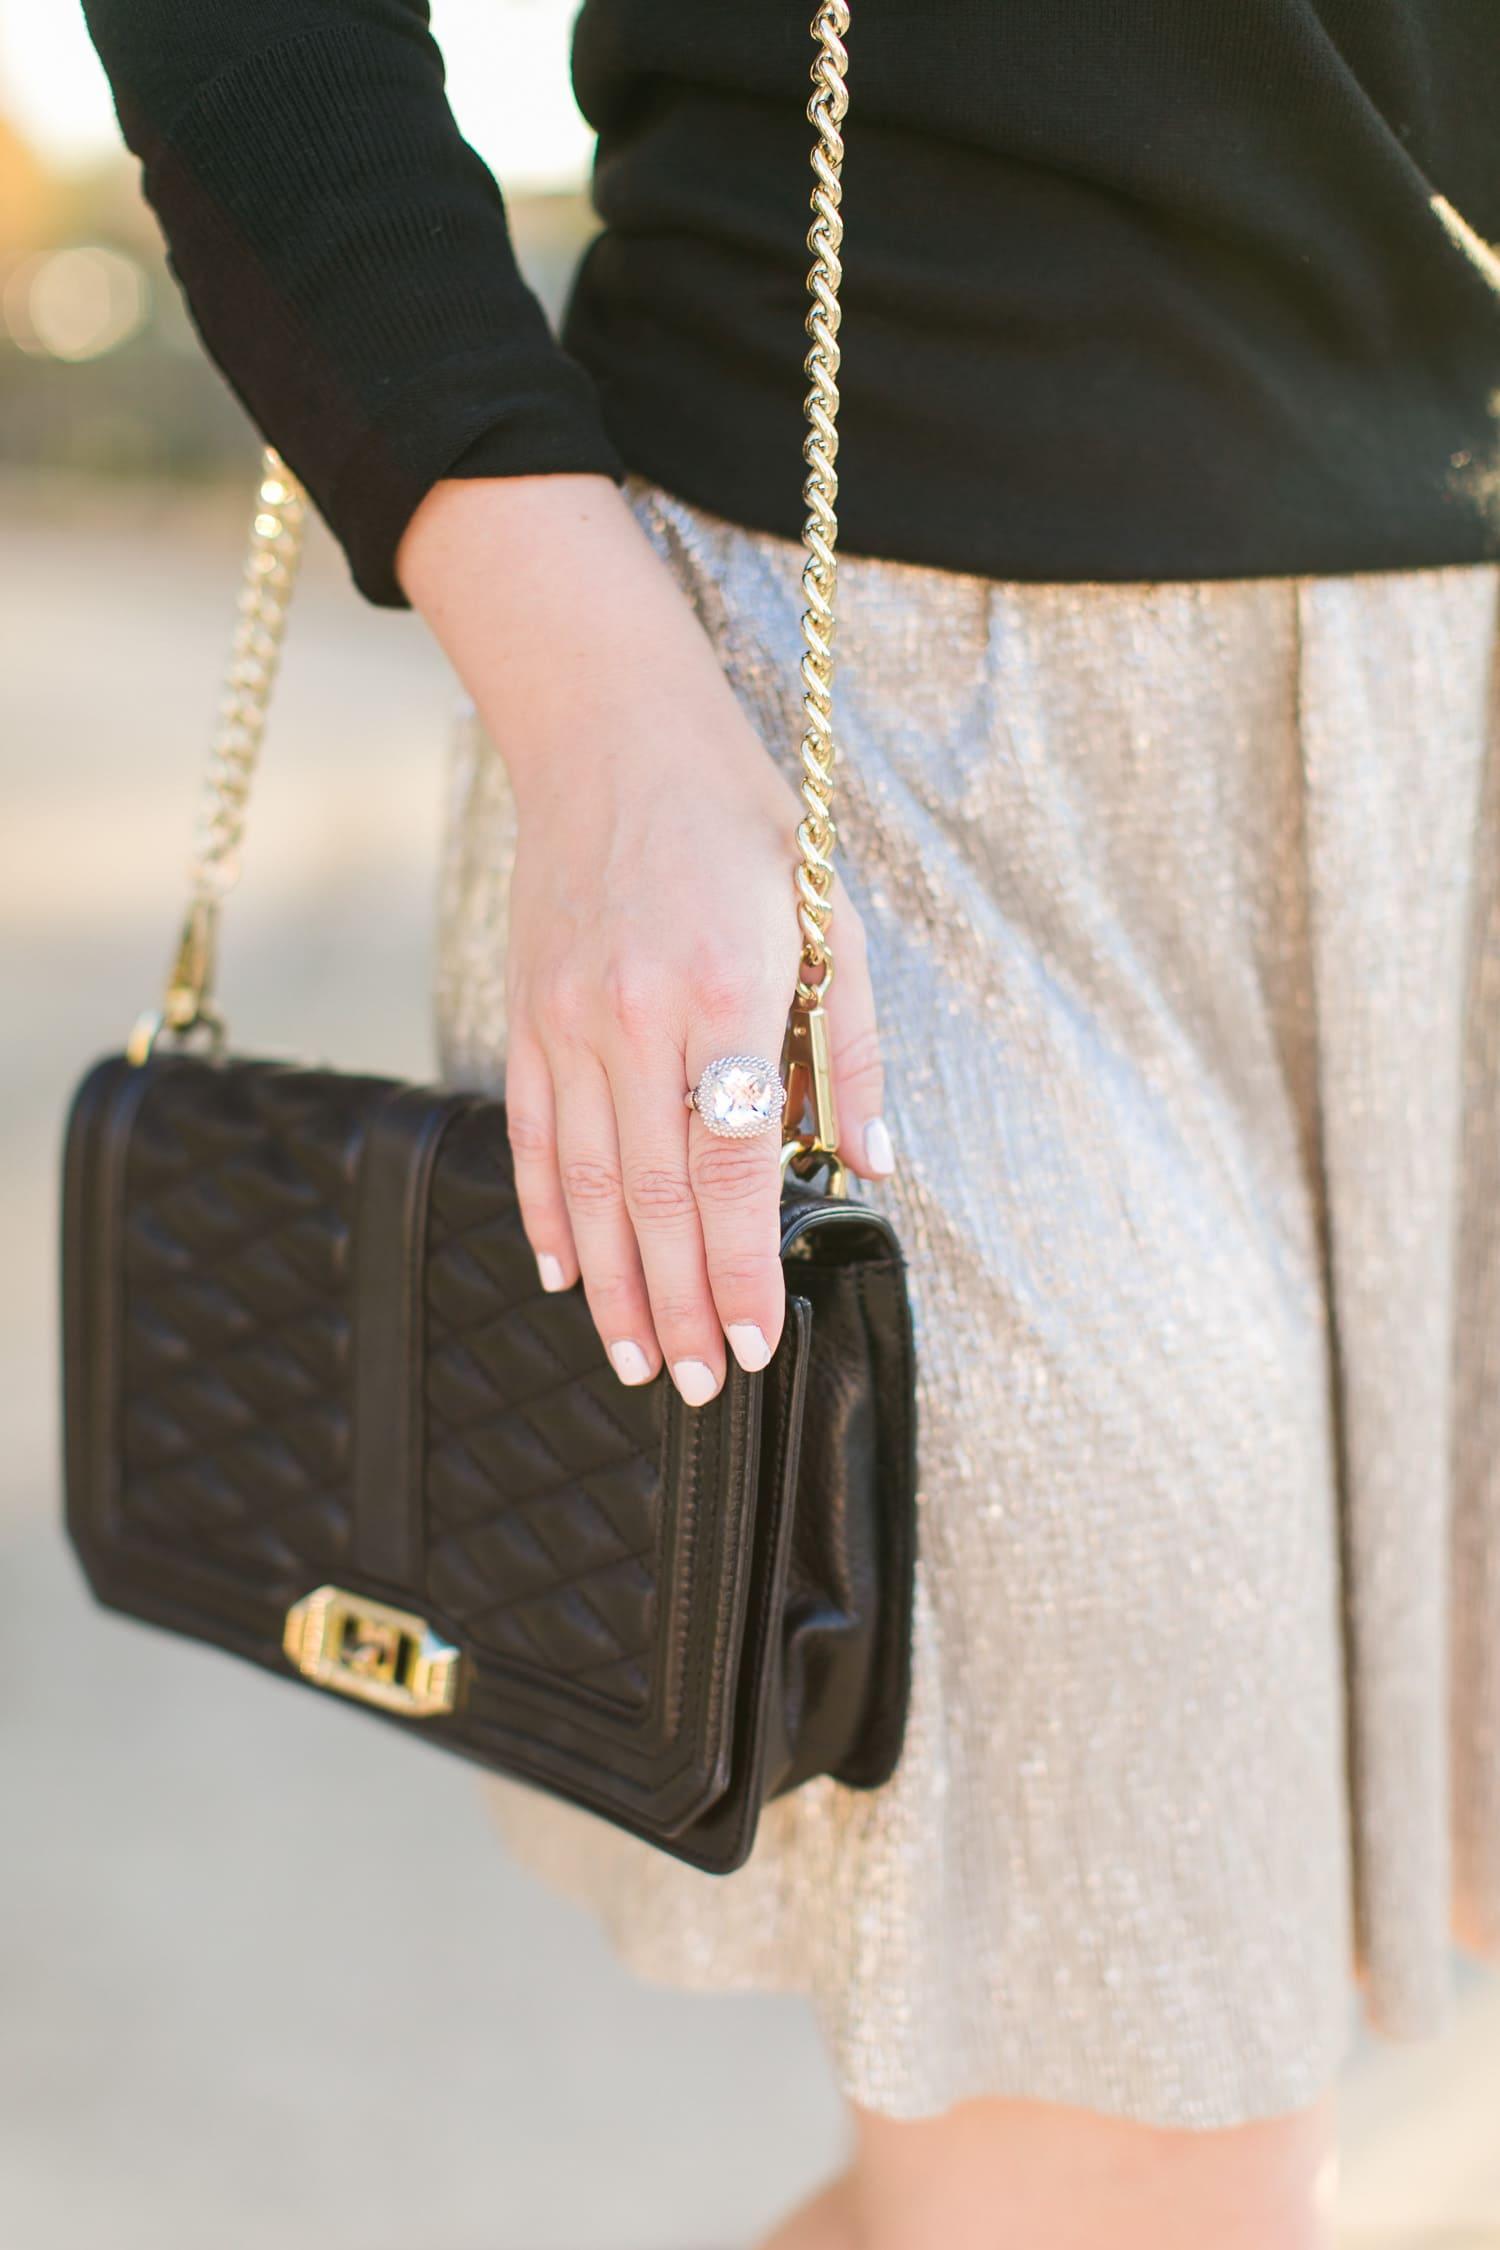 philip gavriel ring, black purse sunset golden hour outfit